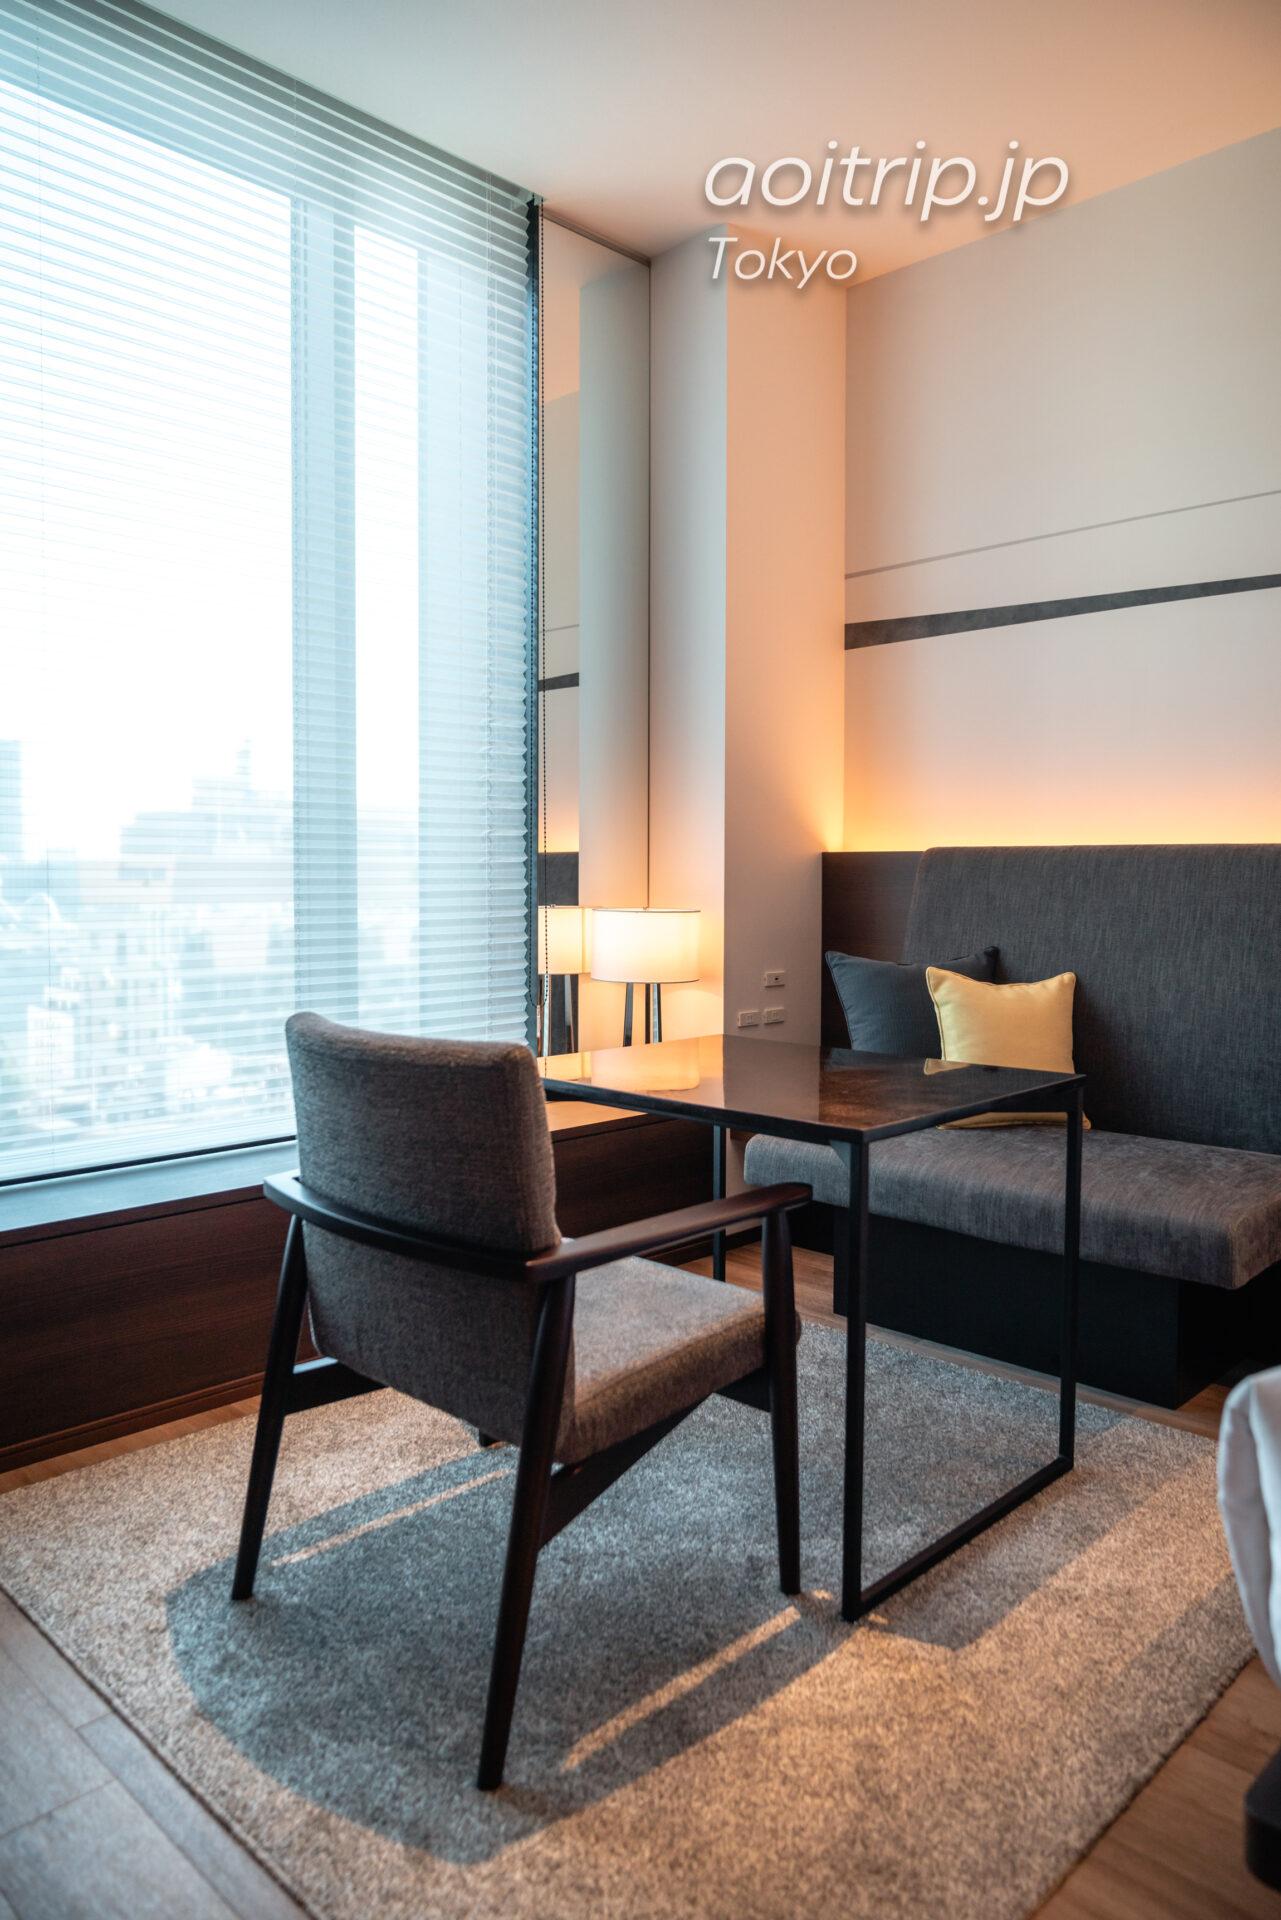 ACホテル東京銀座 AC Hotel Tokyo Ginza プライムスーペリアキング Prime Superior King